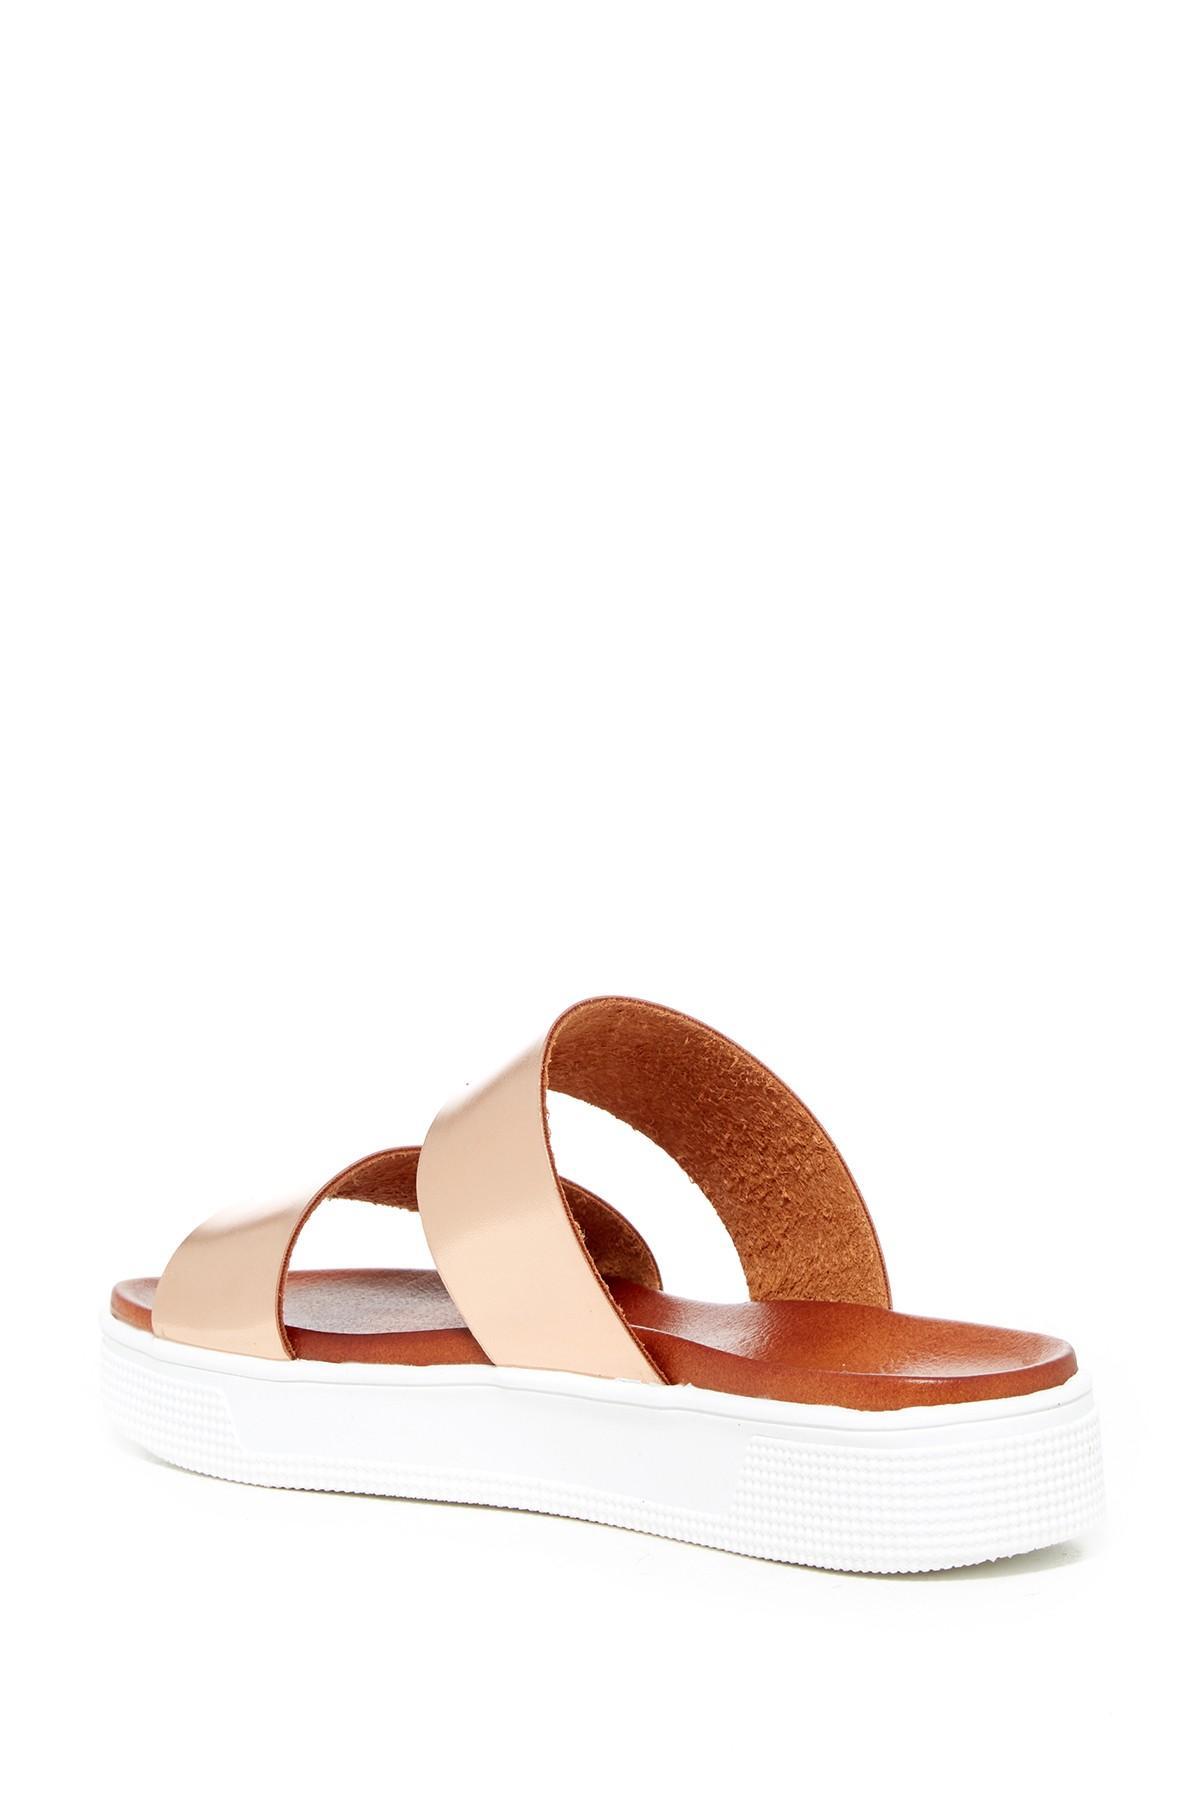 9e4e753ede0 Lyst - MIA Saige Platform Slide Sandal in Brown